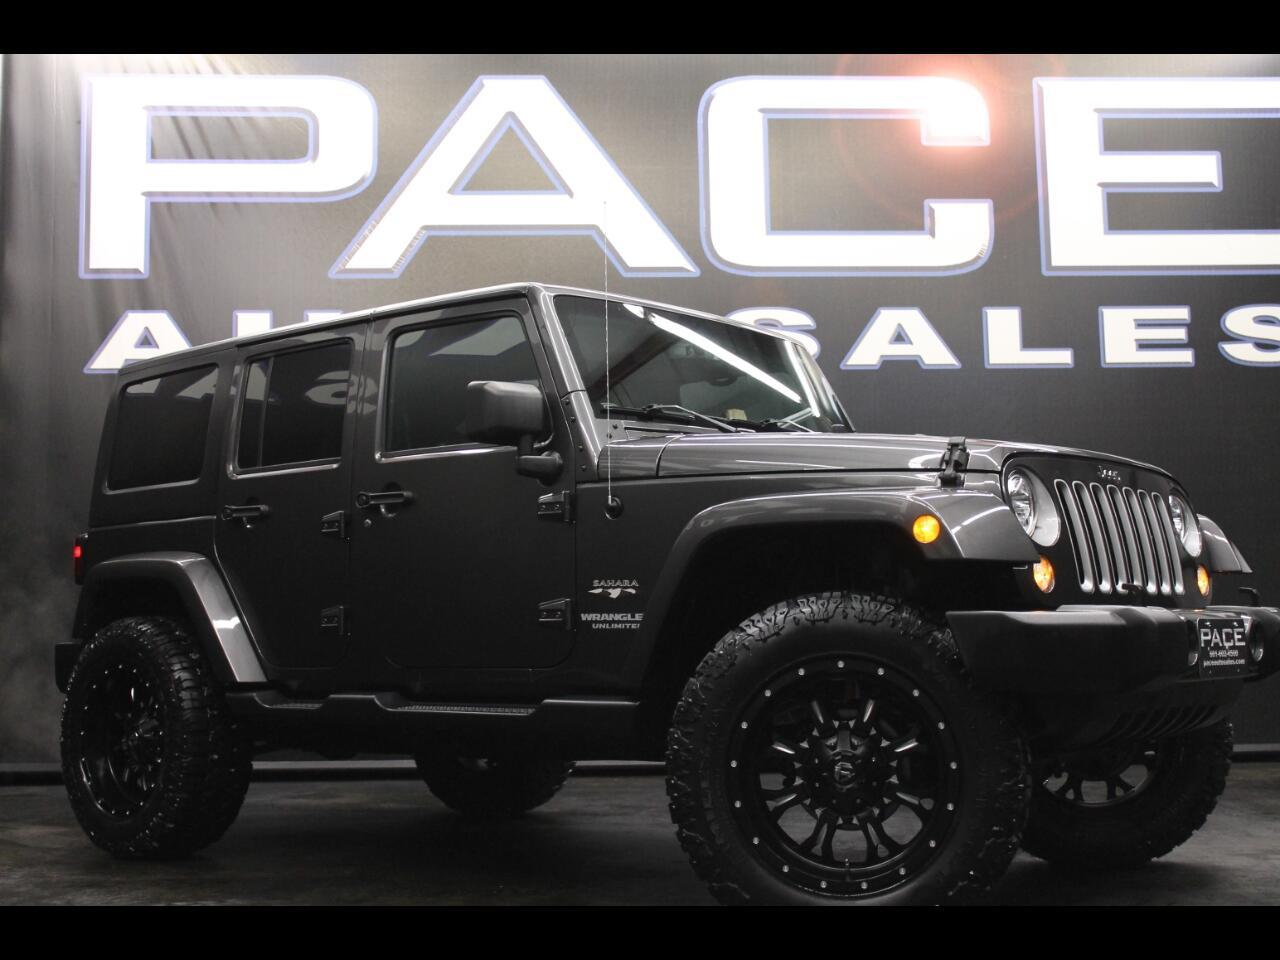 2017 Jeep Wrangler Unlimited Sahara 4WD Lifted Custom